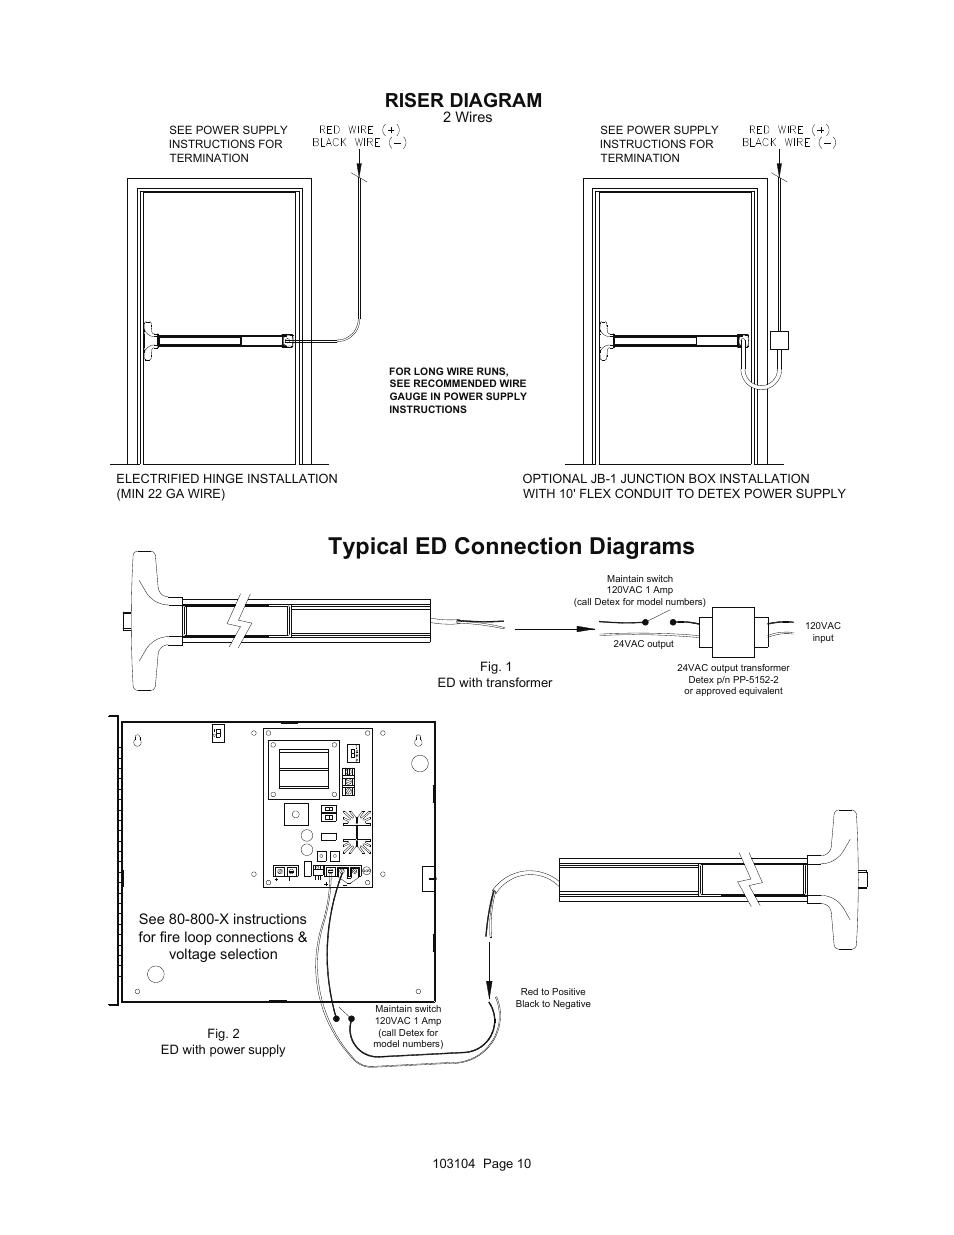 typical ed connection diagrams riser diagram detex v40 er user rh  manualsdir com